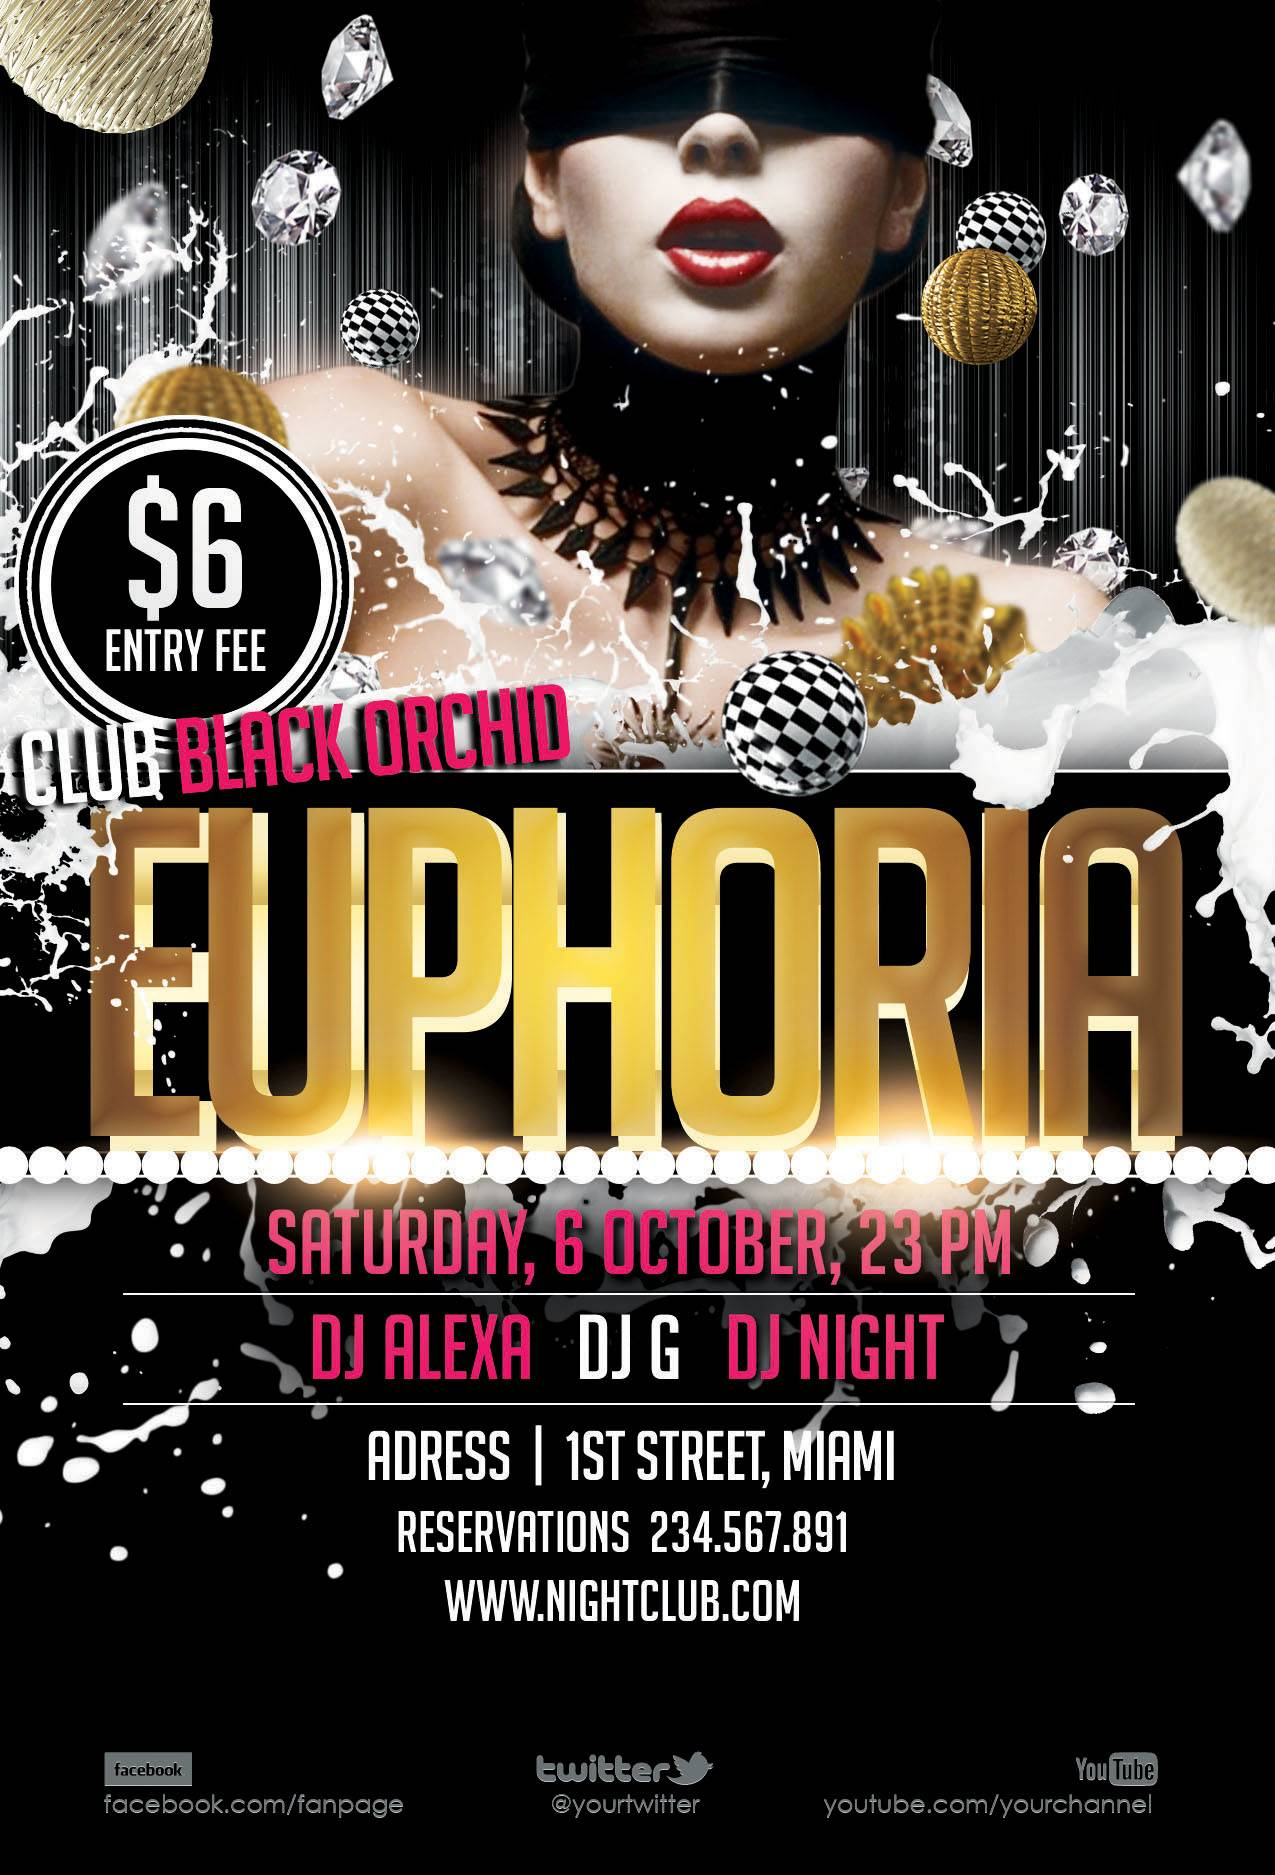 Nightclub Flyer Psd Template Free